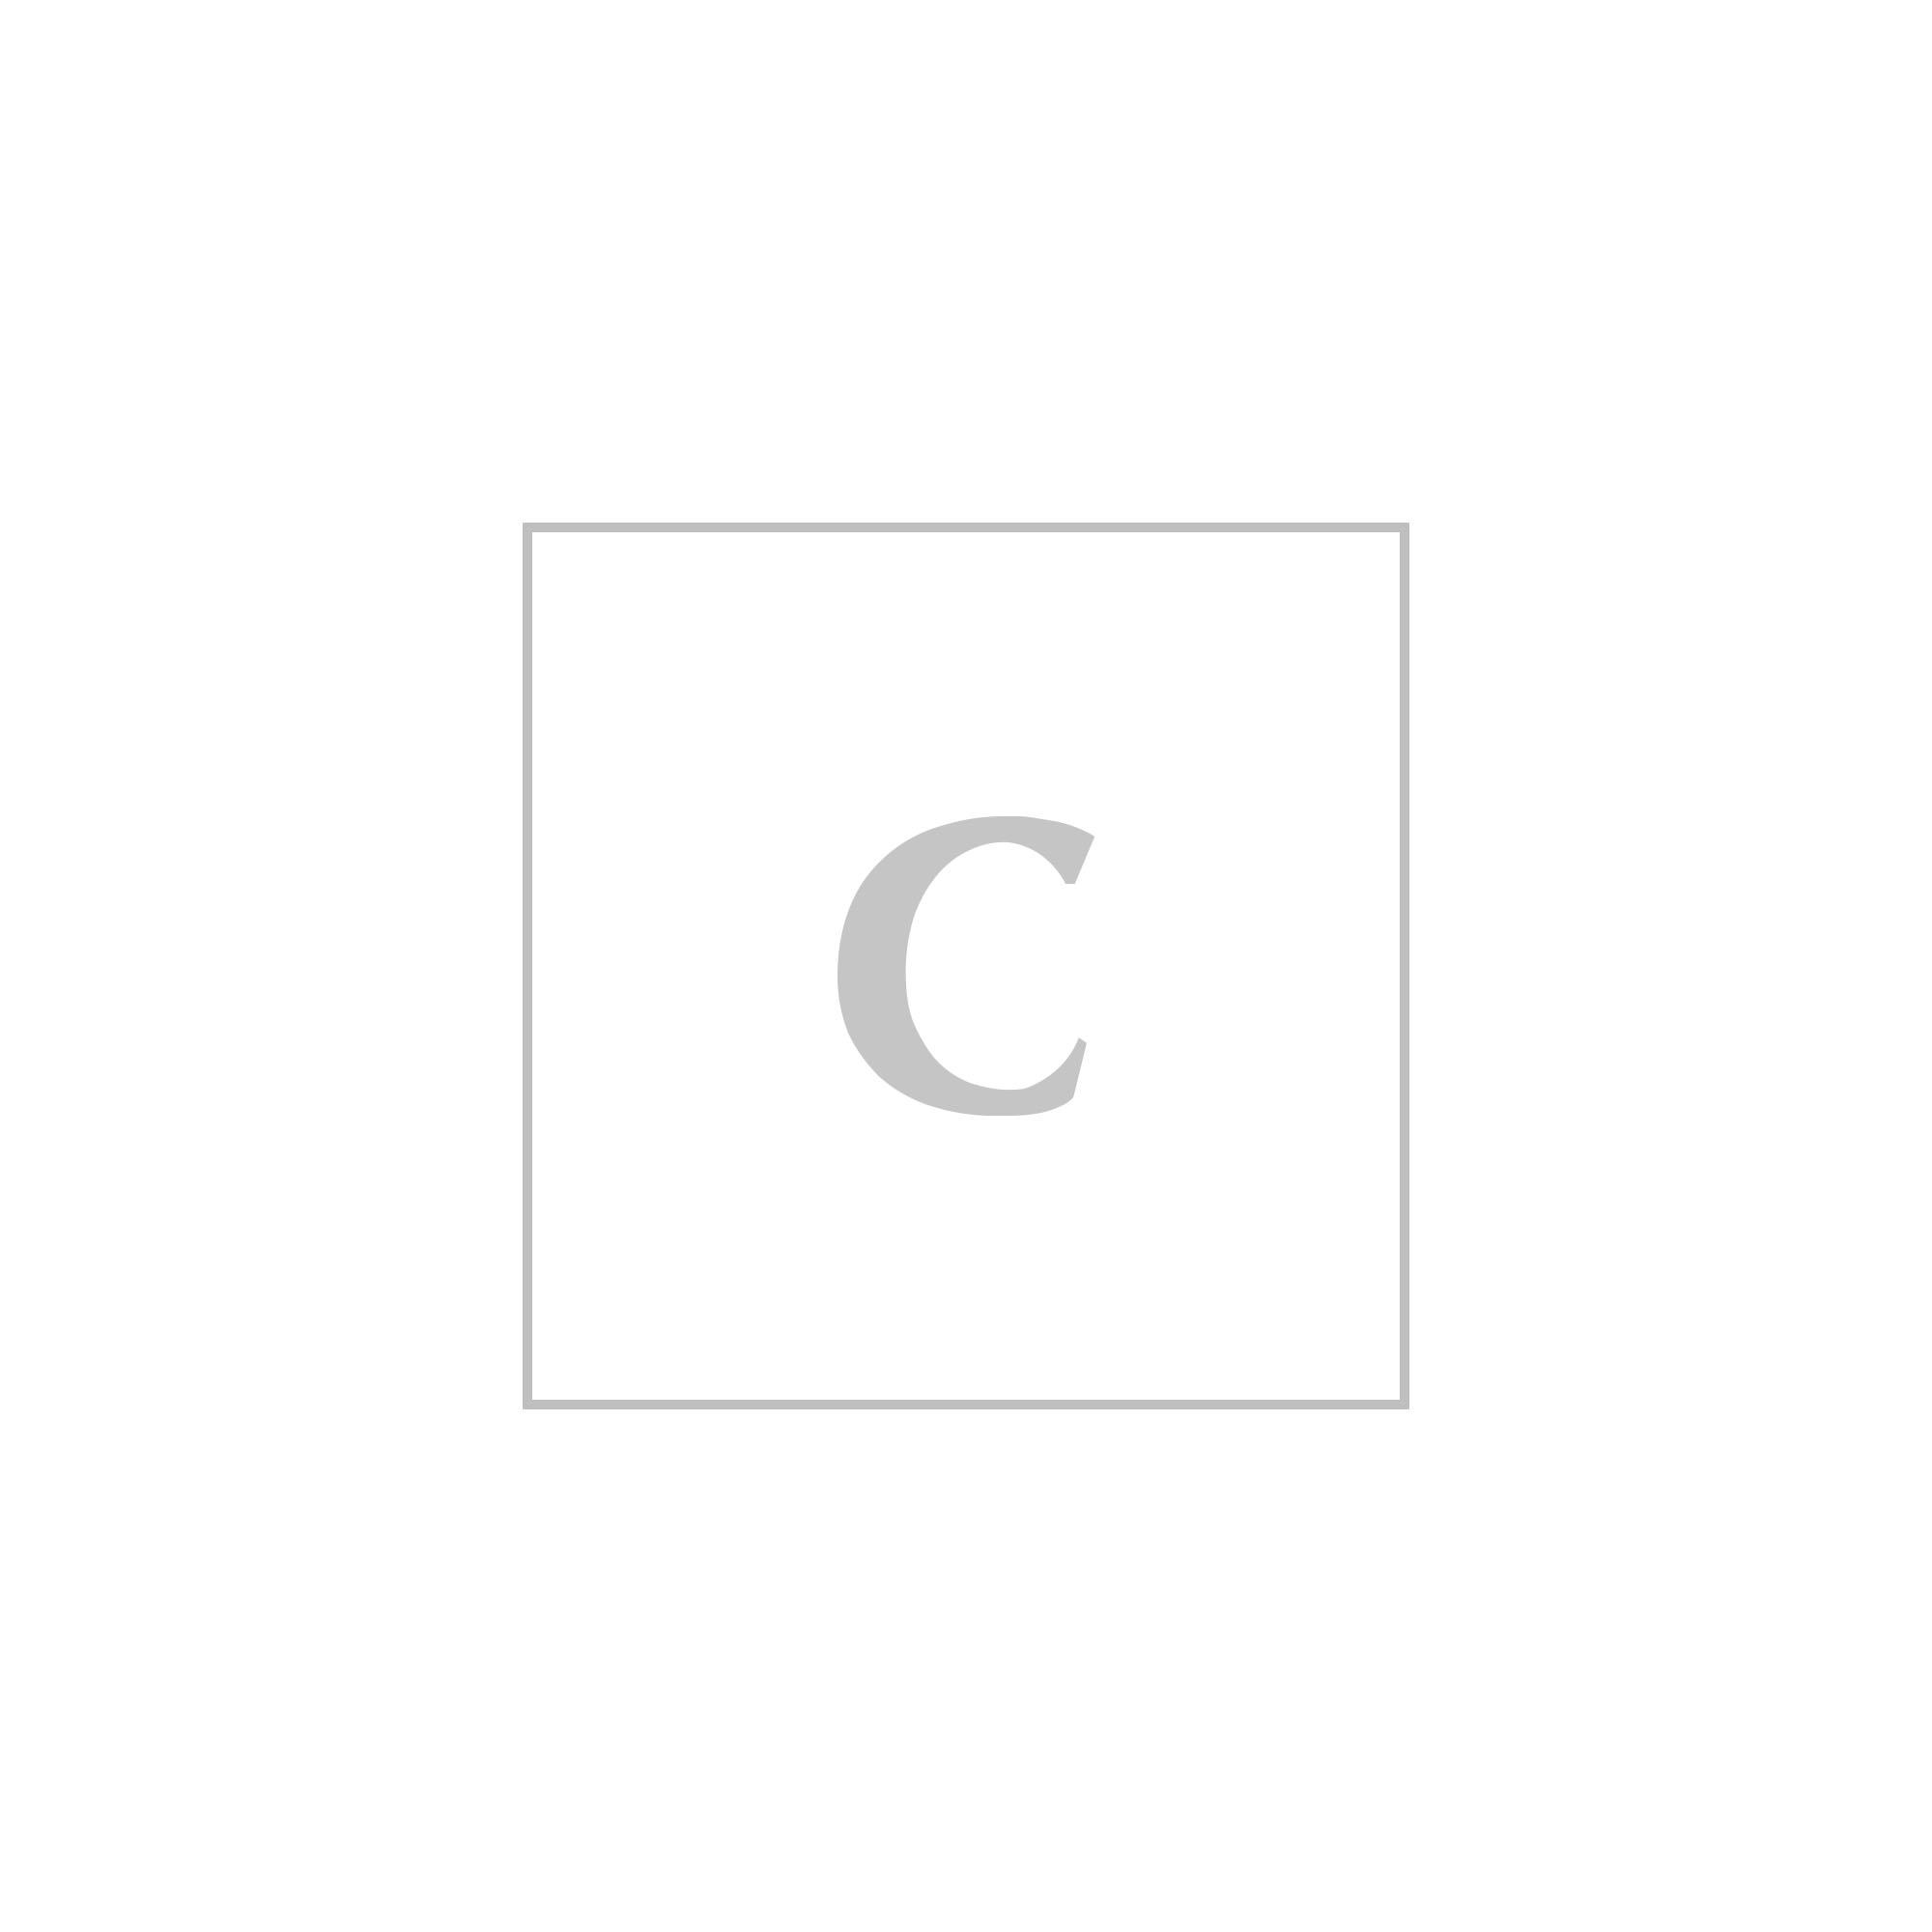 Saint laurent crepe ibiscus glitter shirt